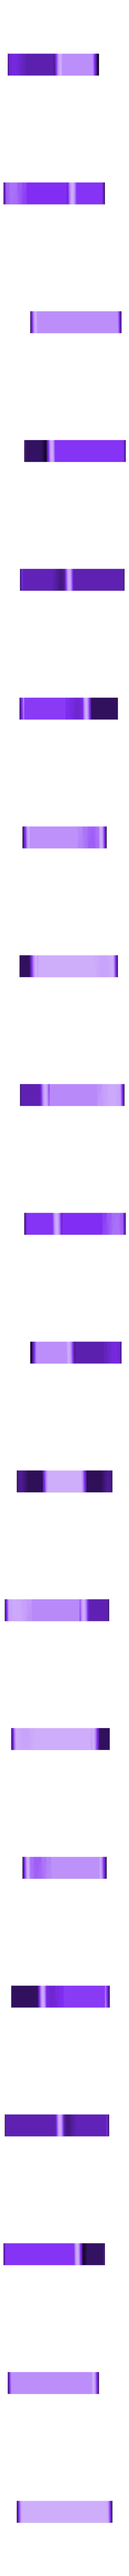 1902-02_Part01_2.STL Download free STL file Satnav holder • 3D printer template, EL3D